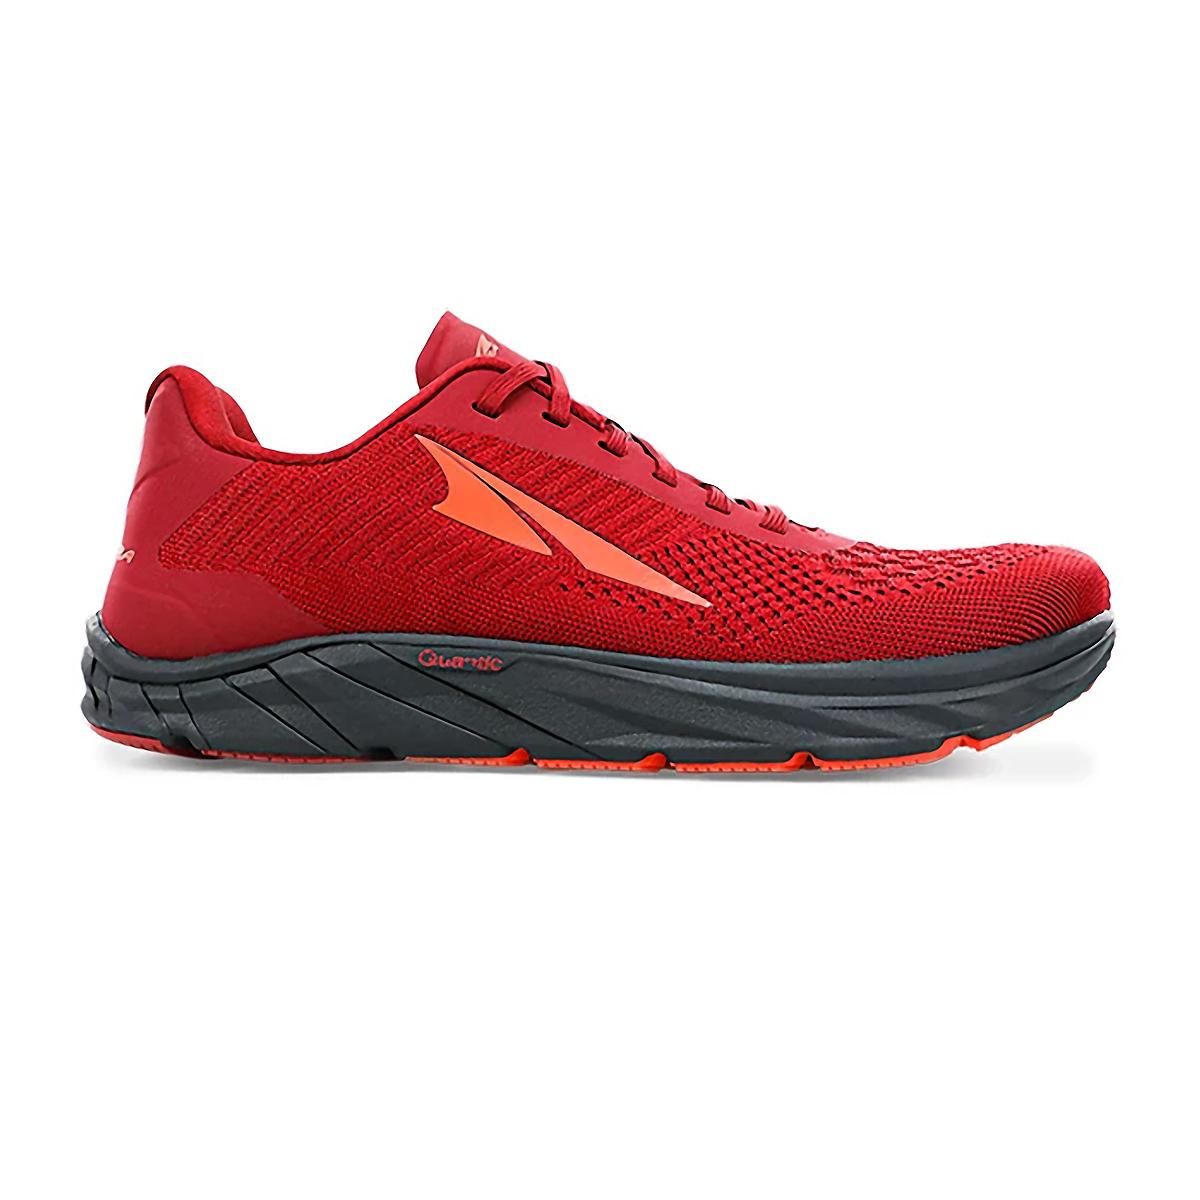 Men's Altra Torin 4.5 Plush Running Shoe - Color: Dark Red - Size: 7 - Width: Regular, Dark Red, large, image 1